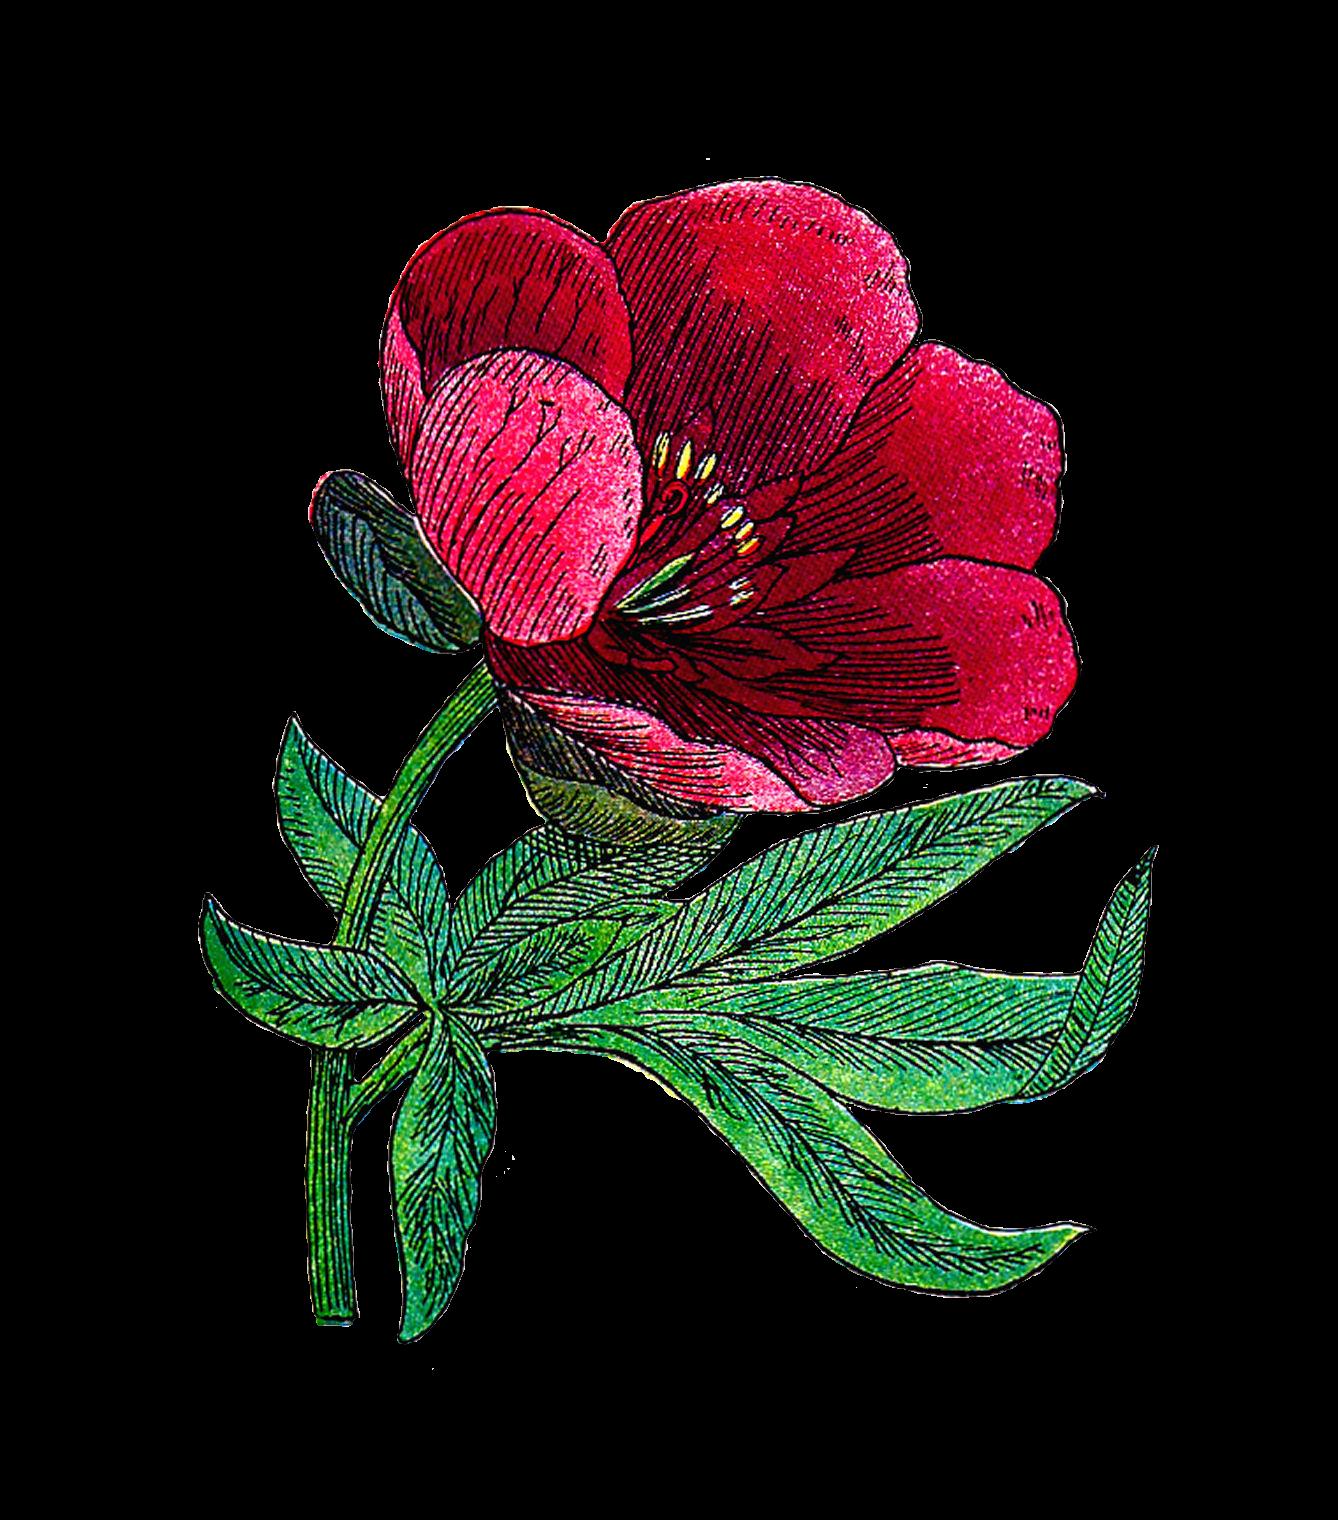 Antique Images: Free Flower Clip Art: 1916 Antique Illustration of.